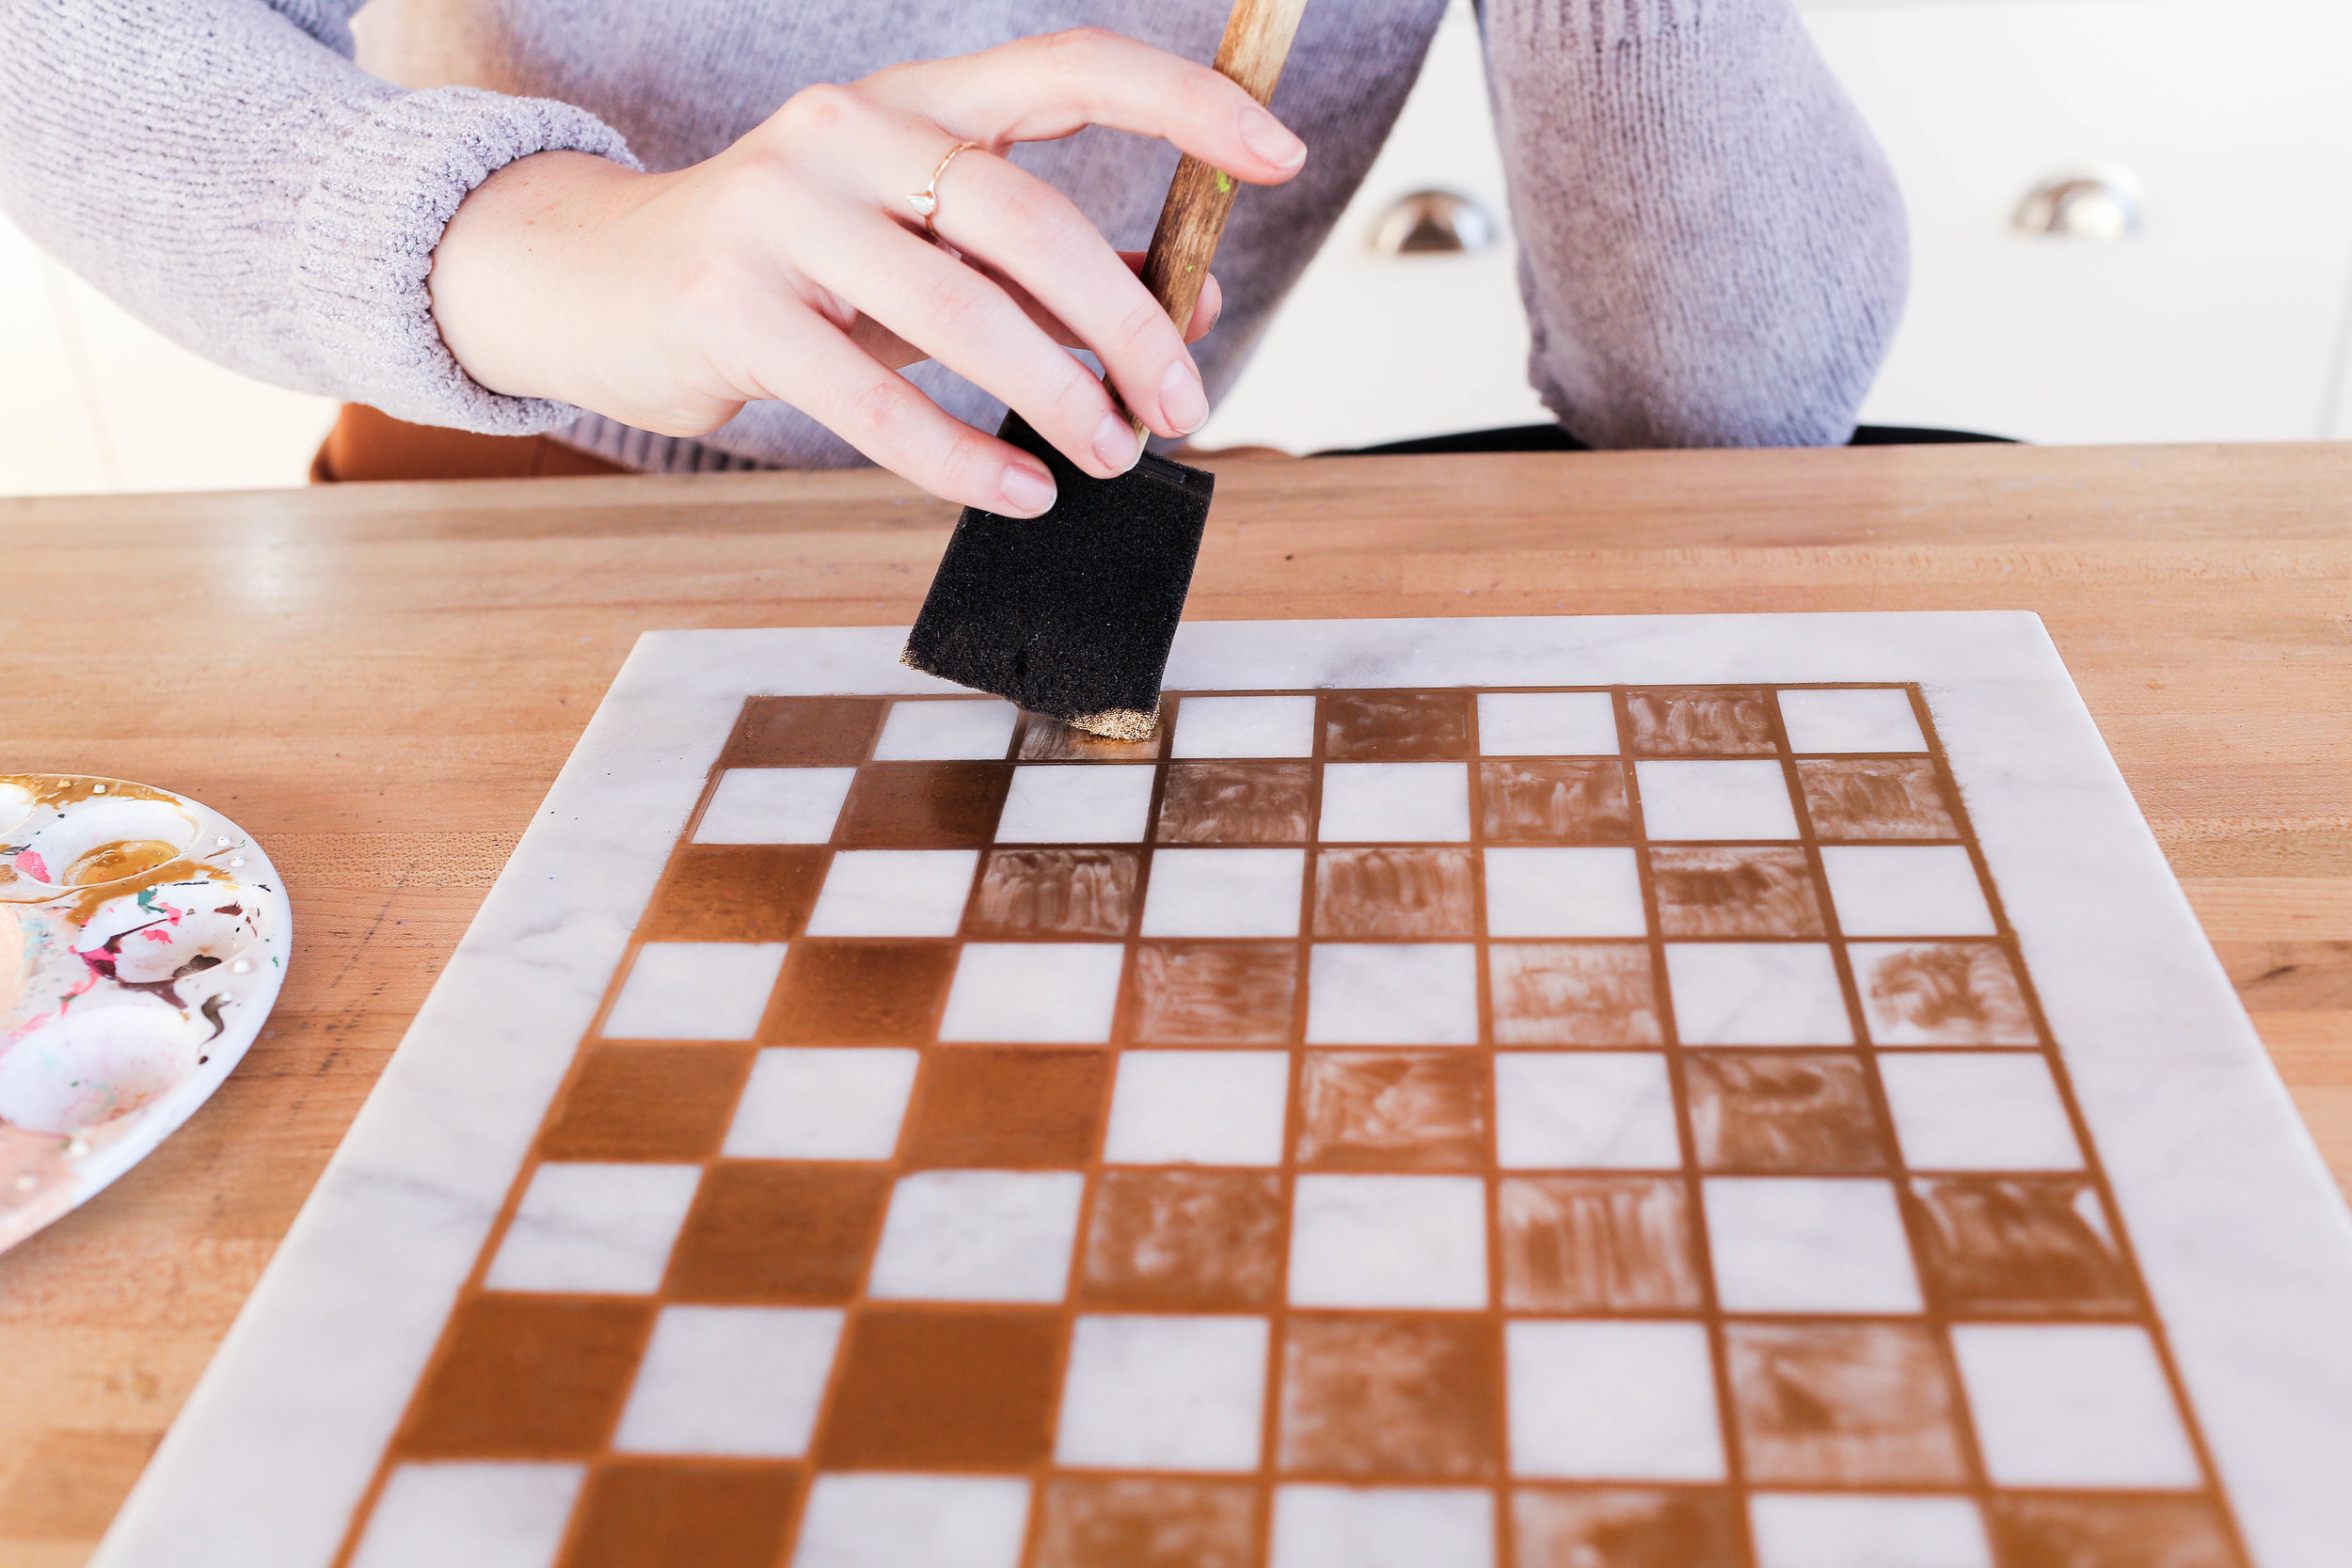 GiftWeek_Chess-14.jpg